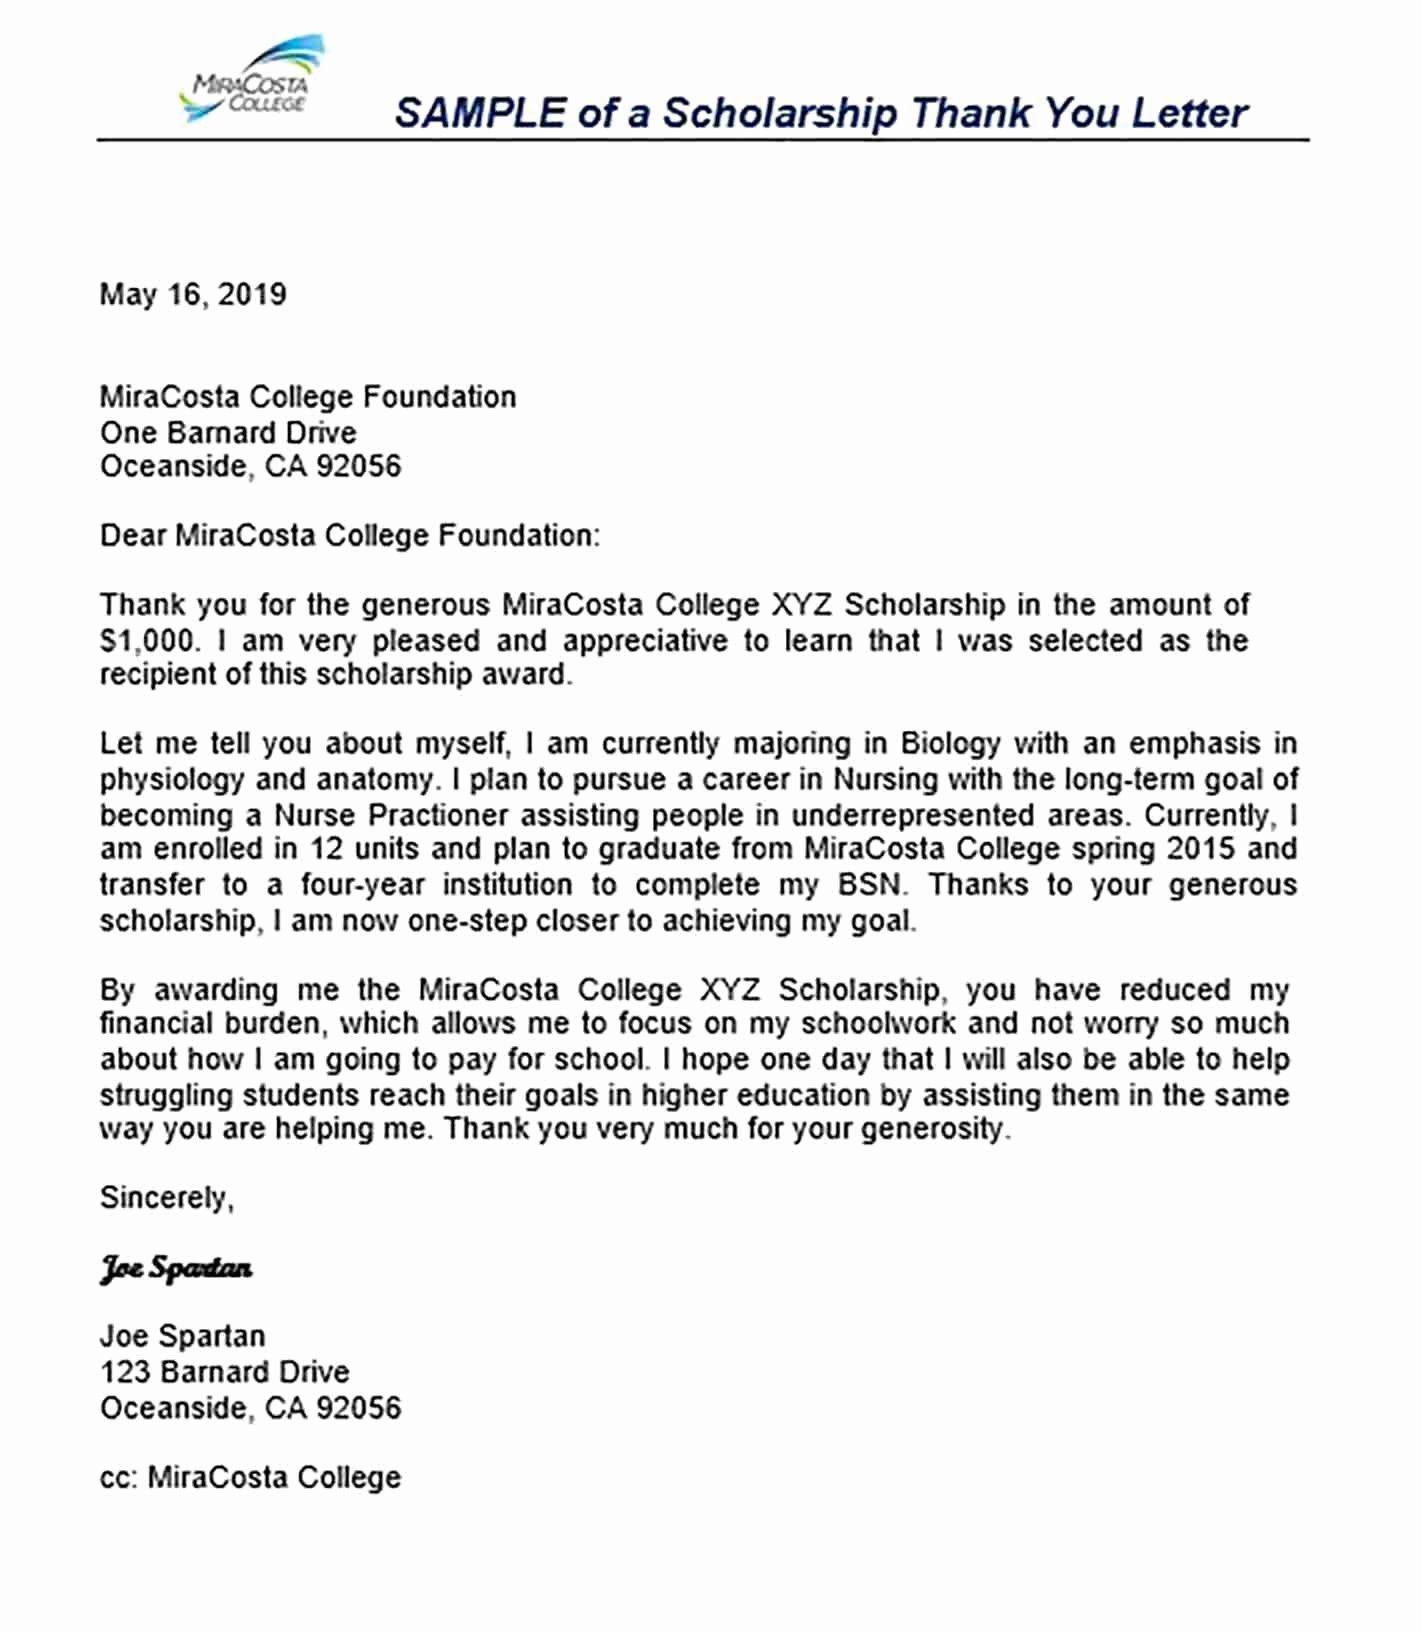 Sample Scholarship Thank You Letter Best Of 11 Scholarship